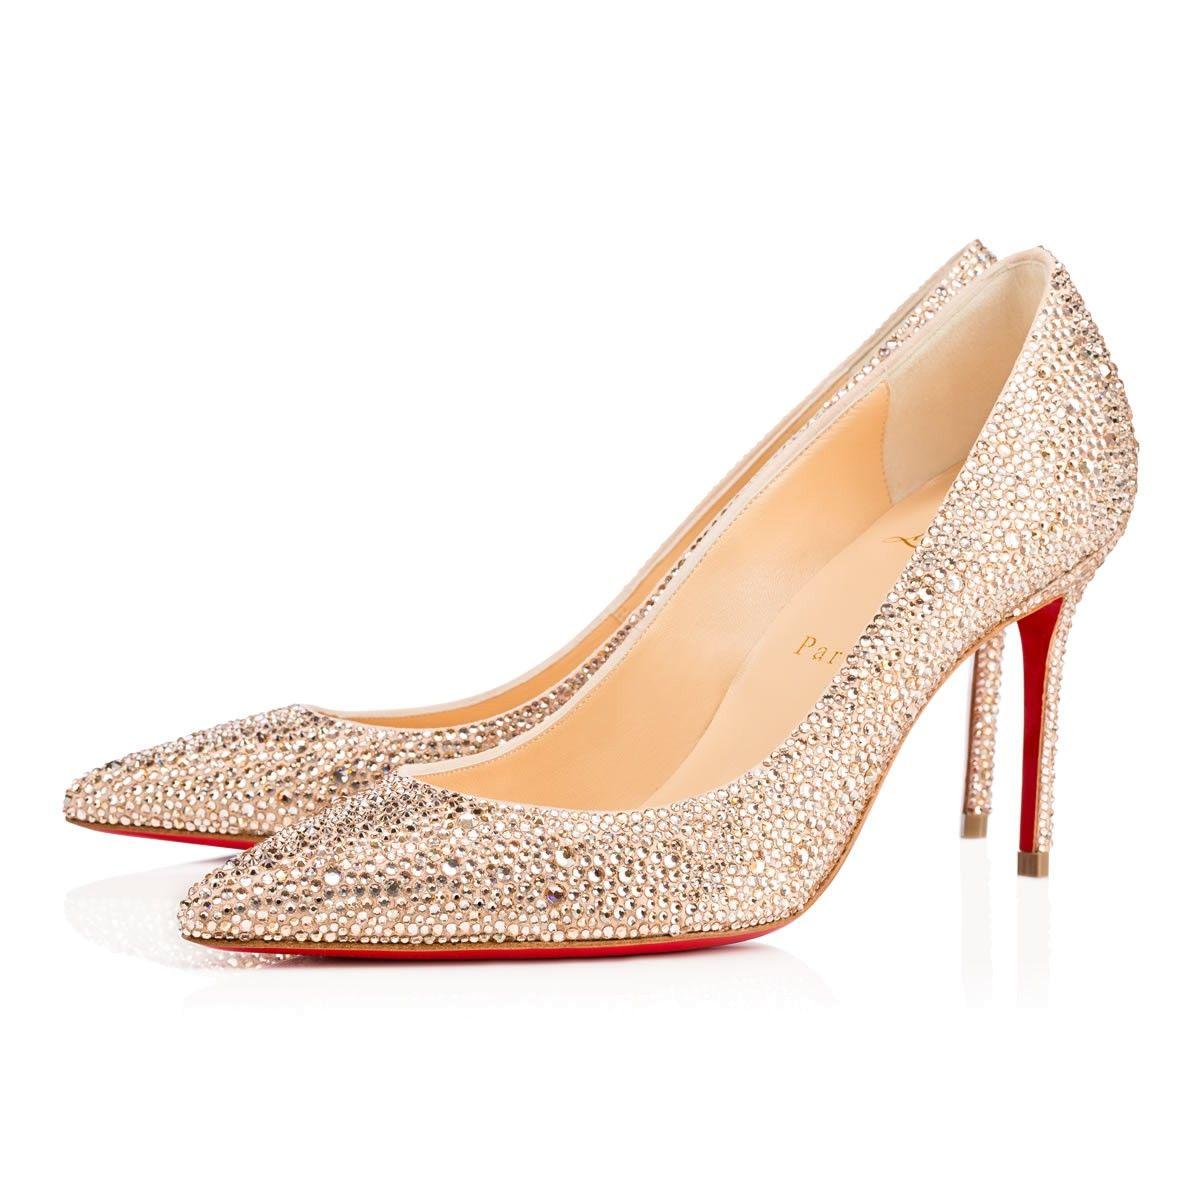 61ba8d1197f Fifille Glitter Givre 100 Perle Glitter - Women Shoes - Christian Louboutin